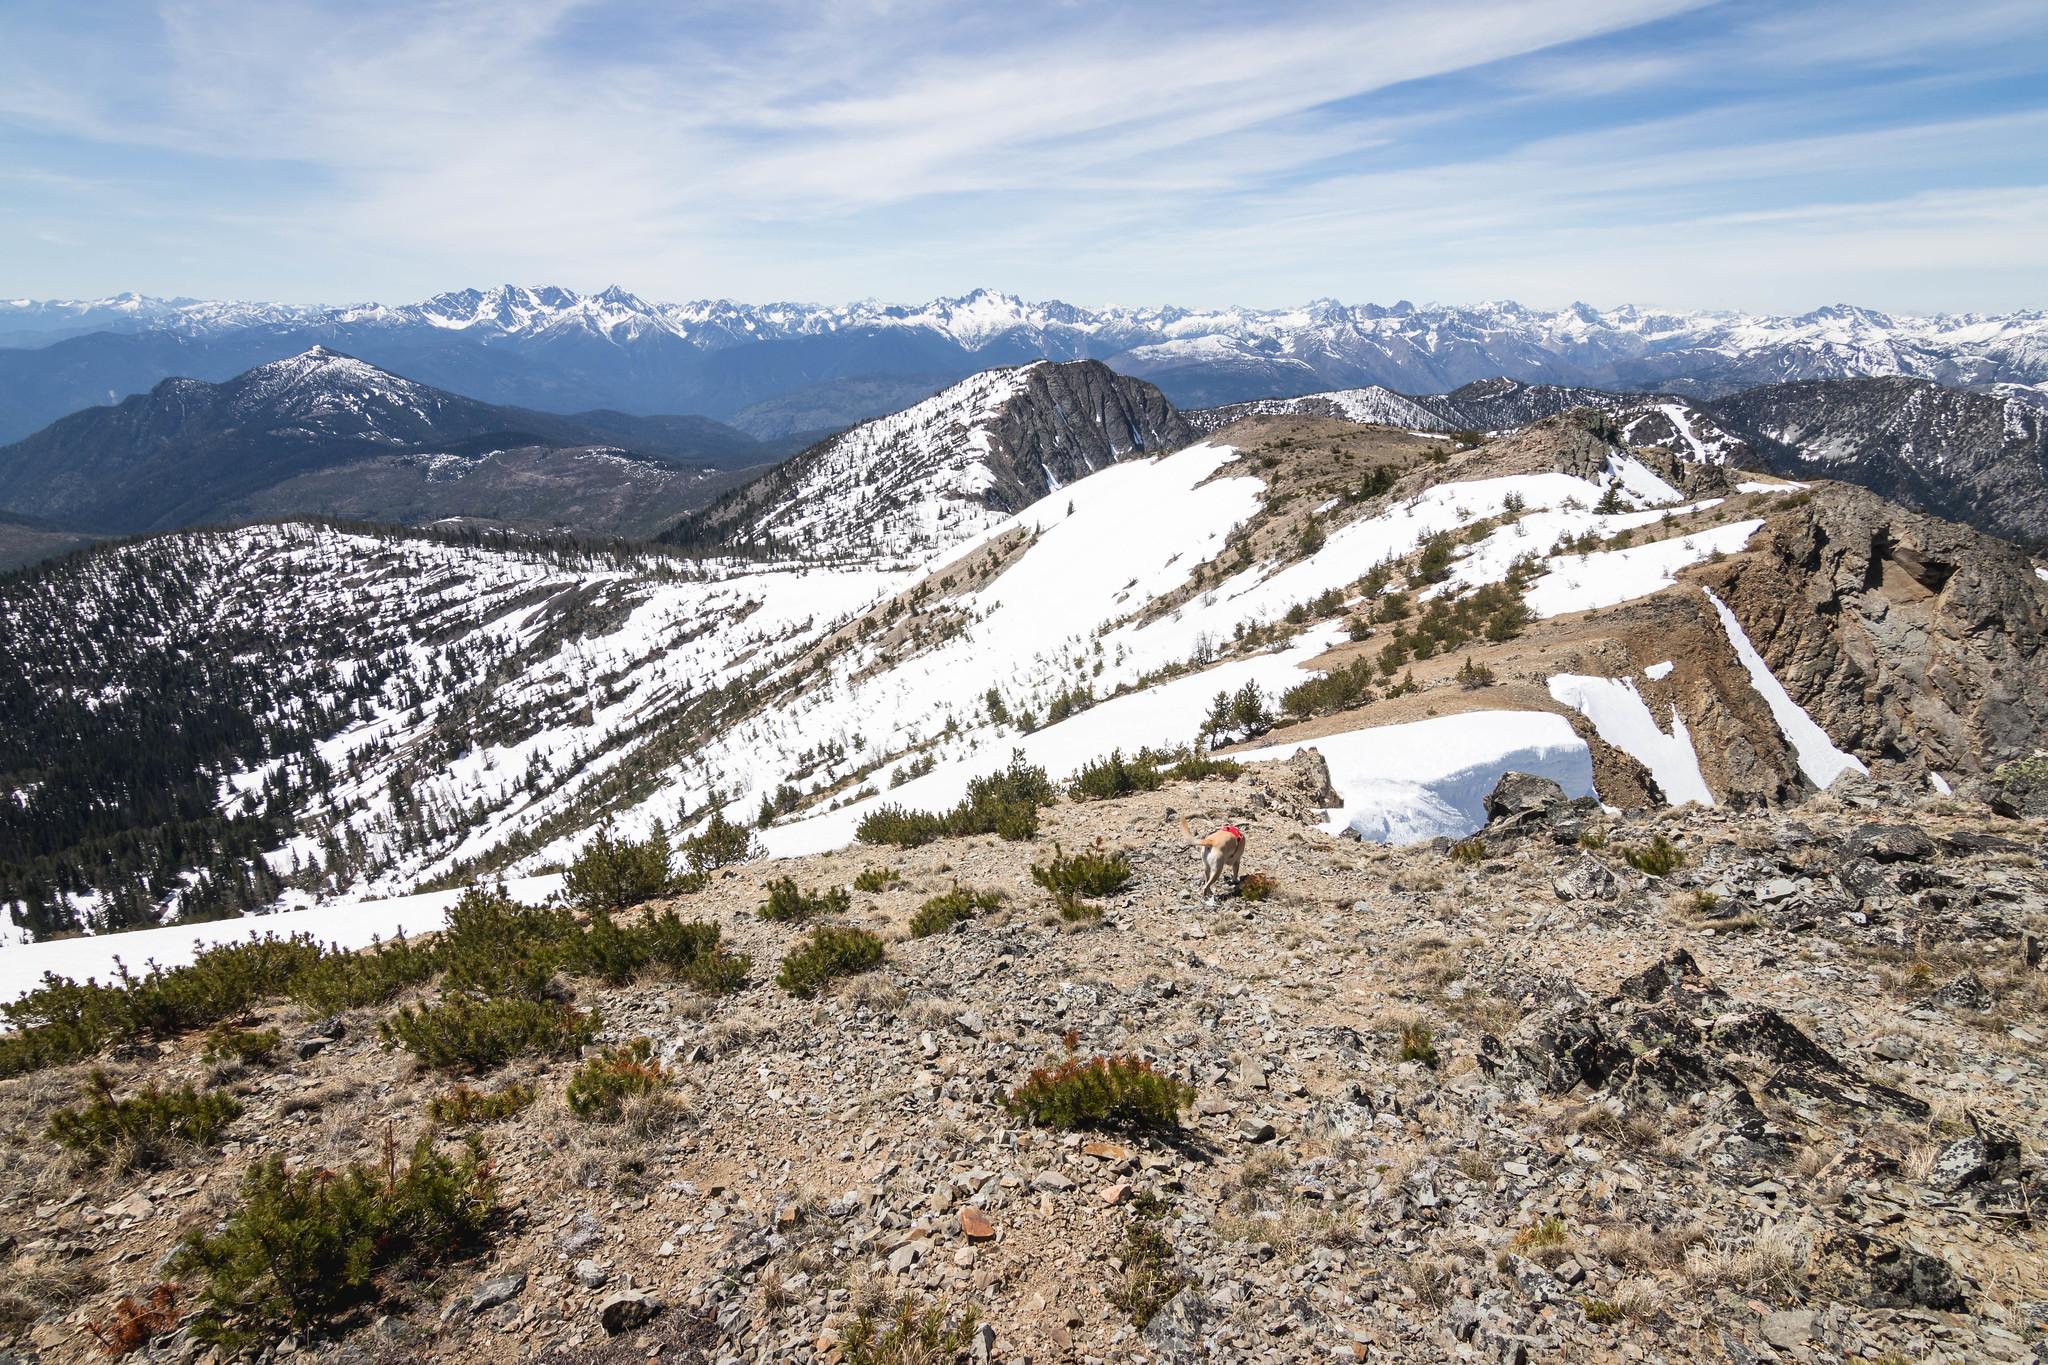 Next stop, Midday Peak